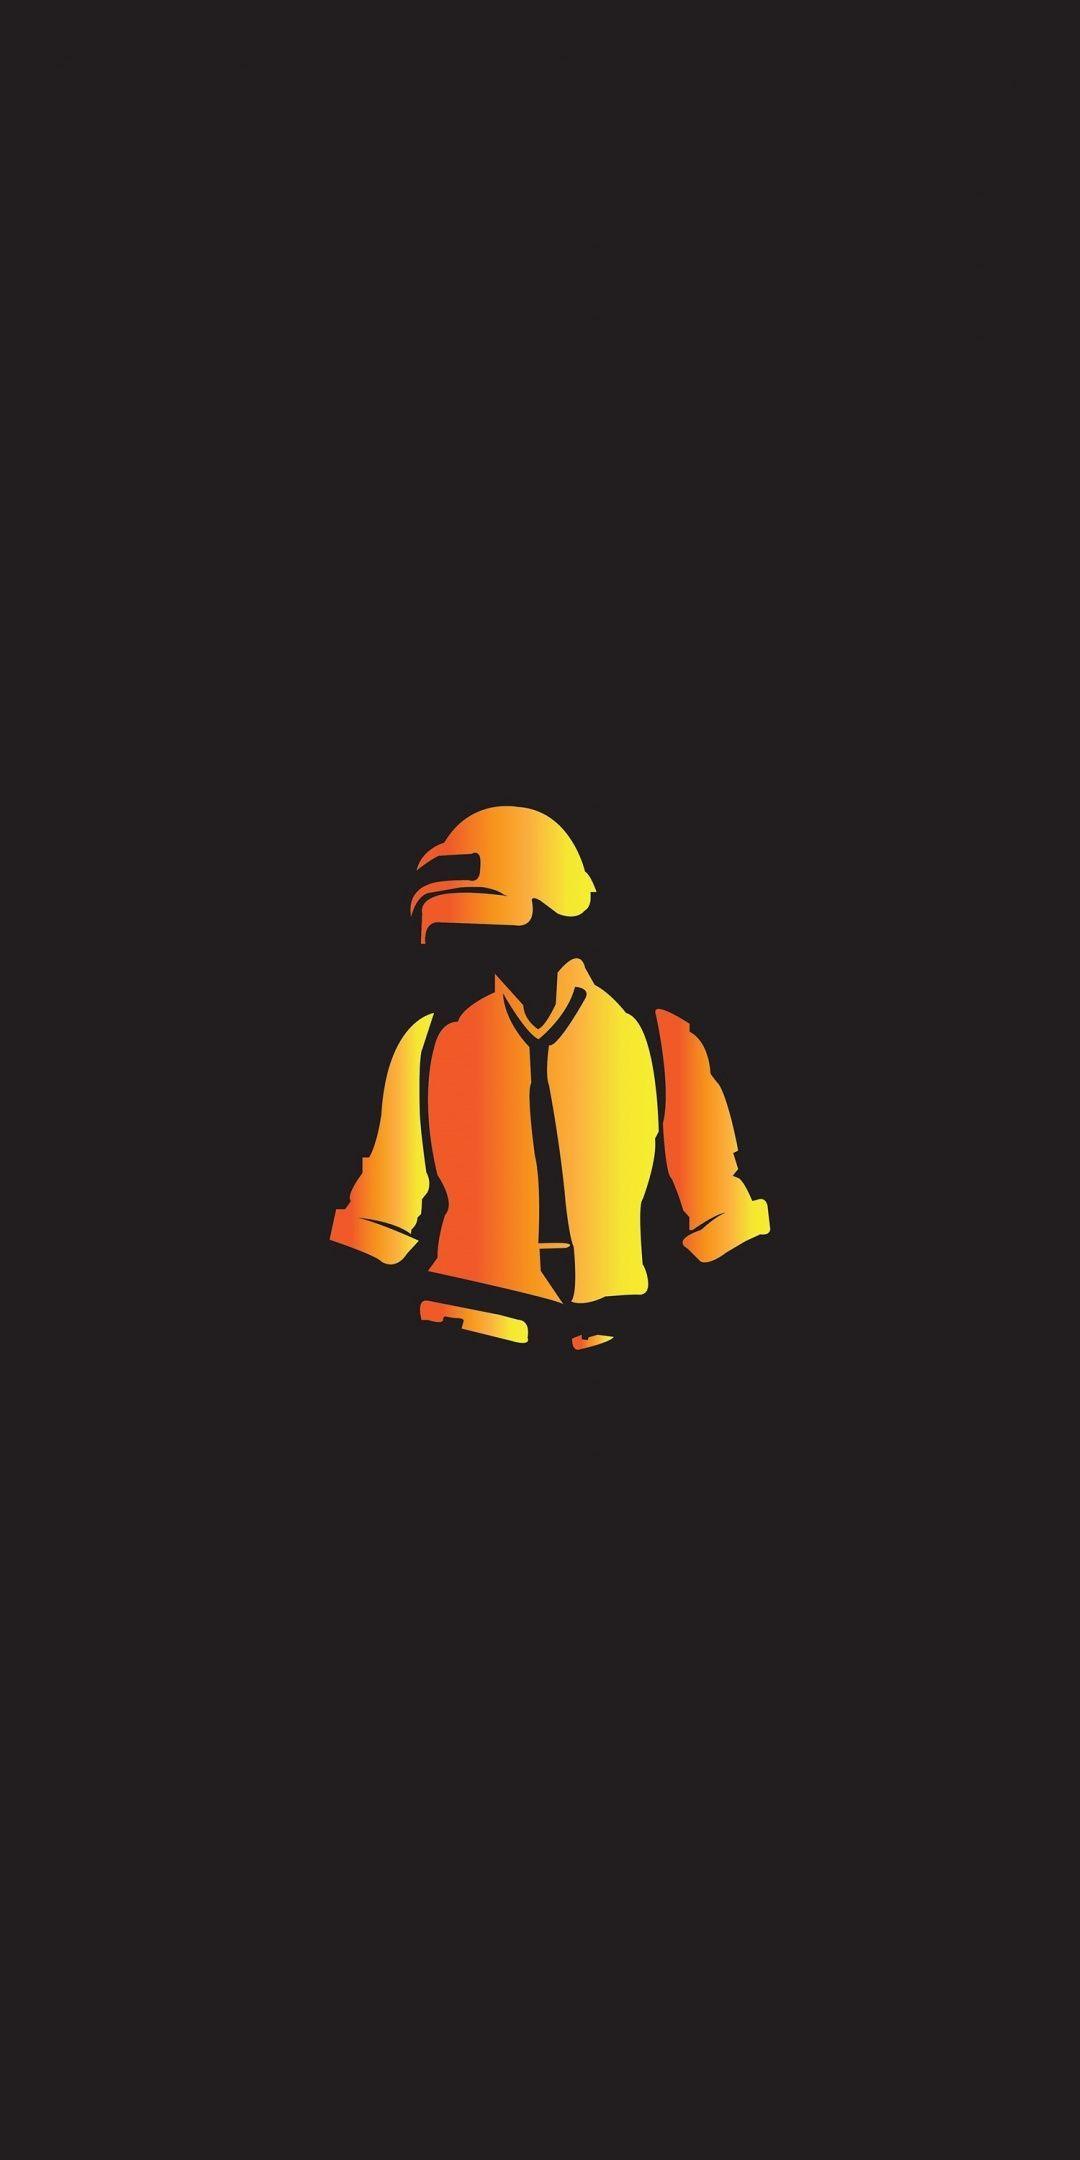 Minimal Pubg Yellow Helmet Guy Art 1080x2160 Wallpaper In 2021 Pubg Wallpaper Wallpaper Pubg Pubg Wallpapers